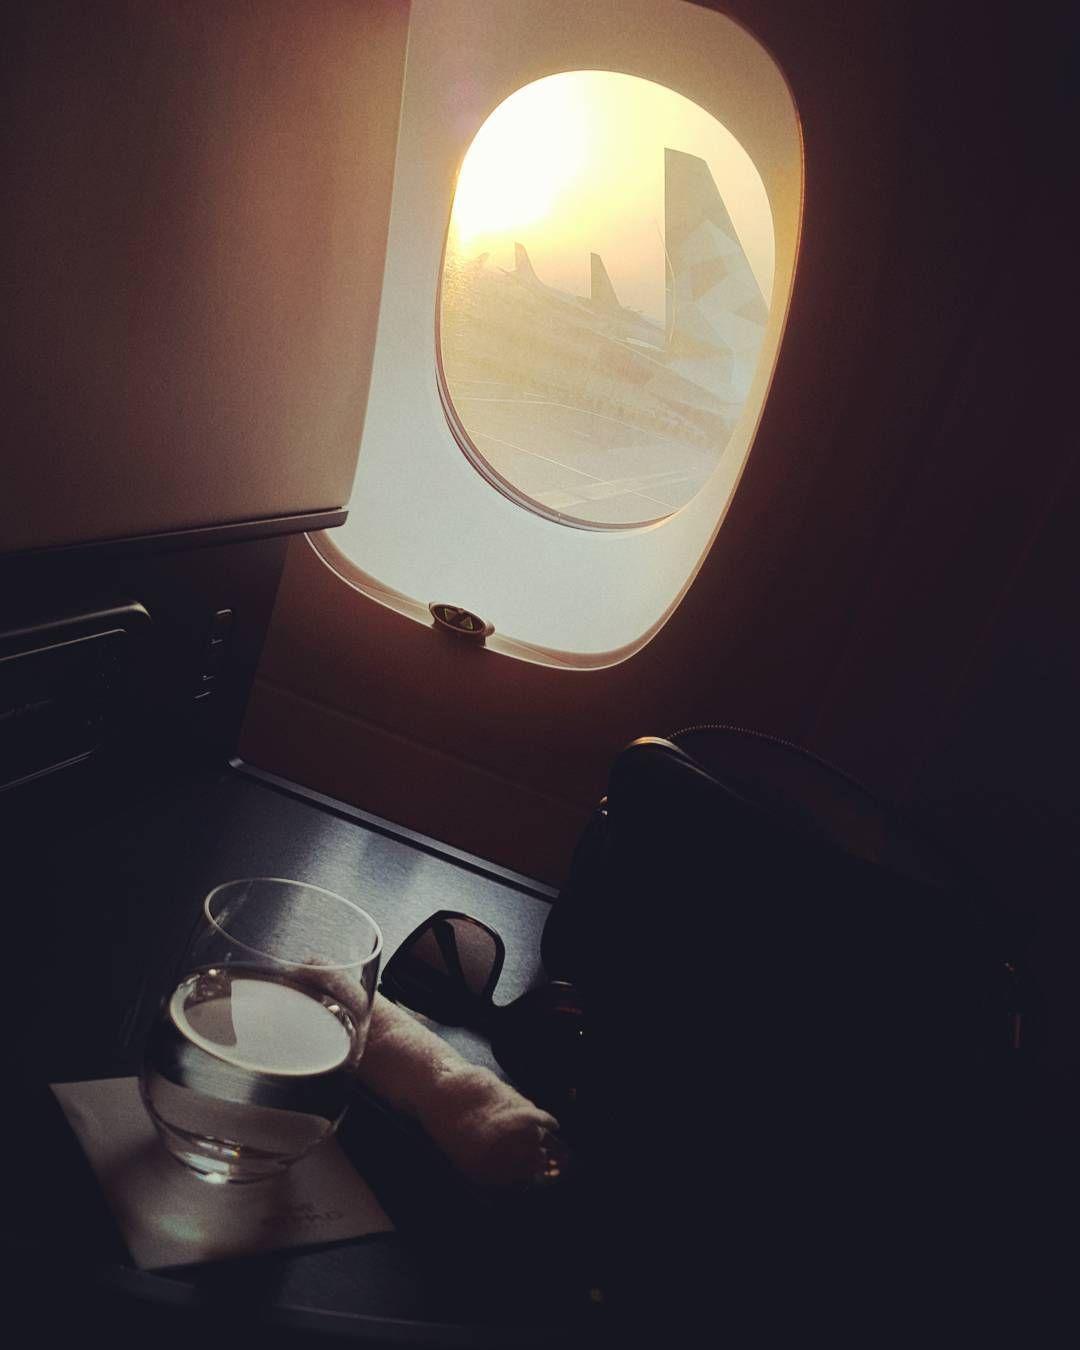 Najwa Albreiki On Instagram To London س ب حان ال ذ ي س خ ر ل ن ا ه ذ ا و م ا ك ن ا ل ه م ق ر ن ين و إ Wall Lights Instagram Posts Instagram